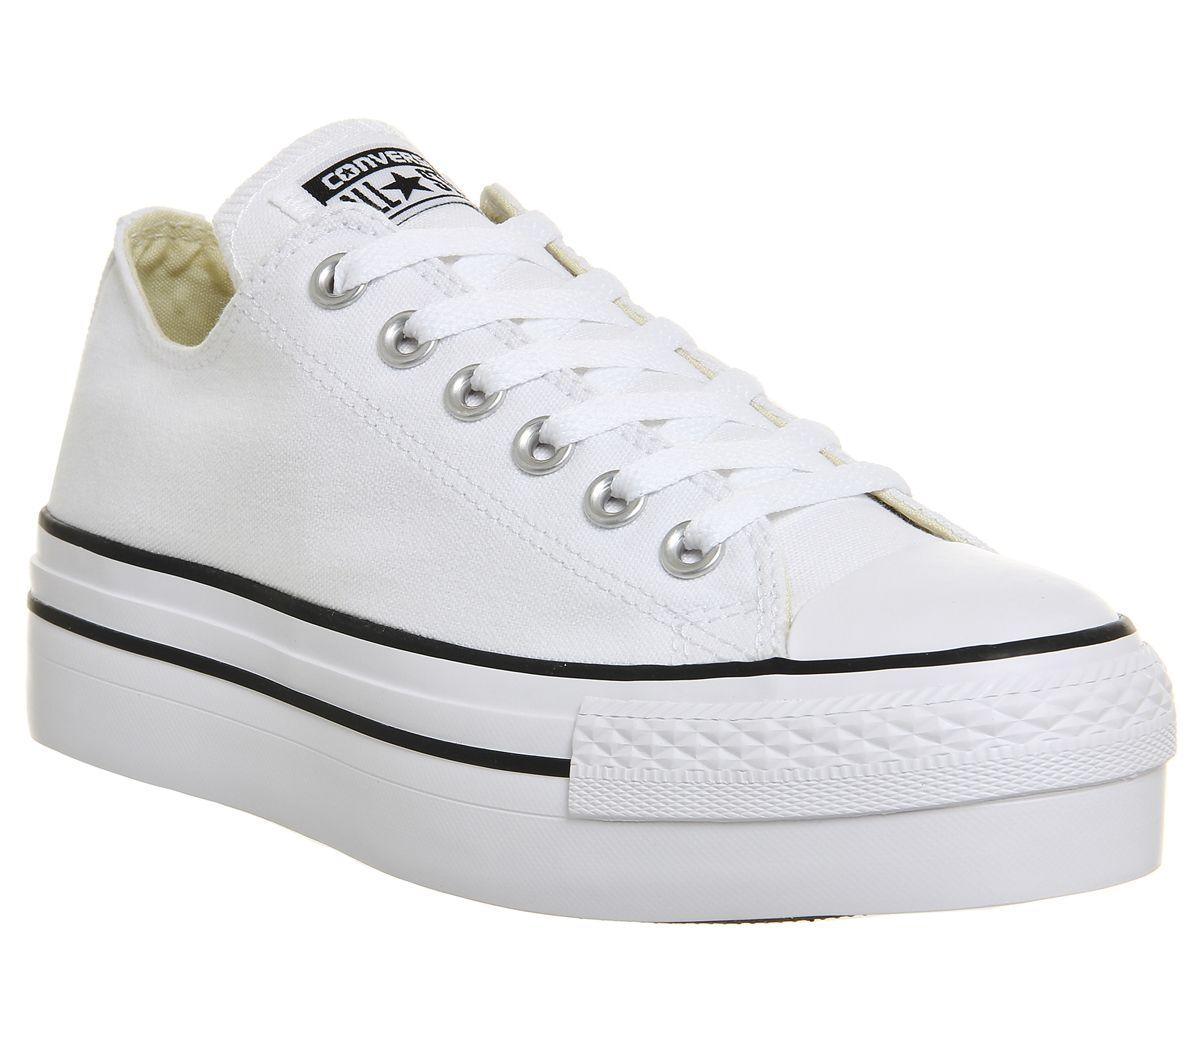 22d565dc5ae8 Converse All Star Low Platform White - junior